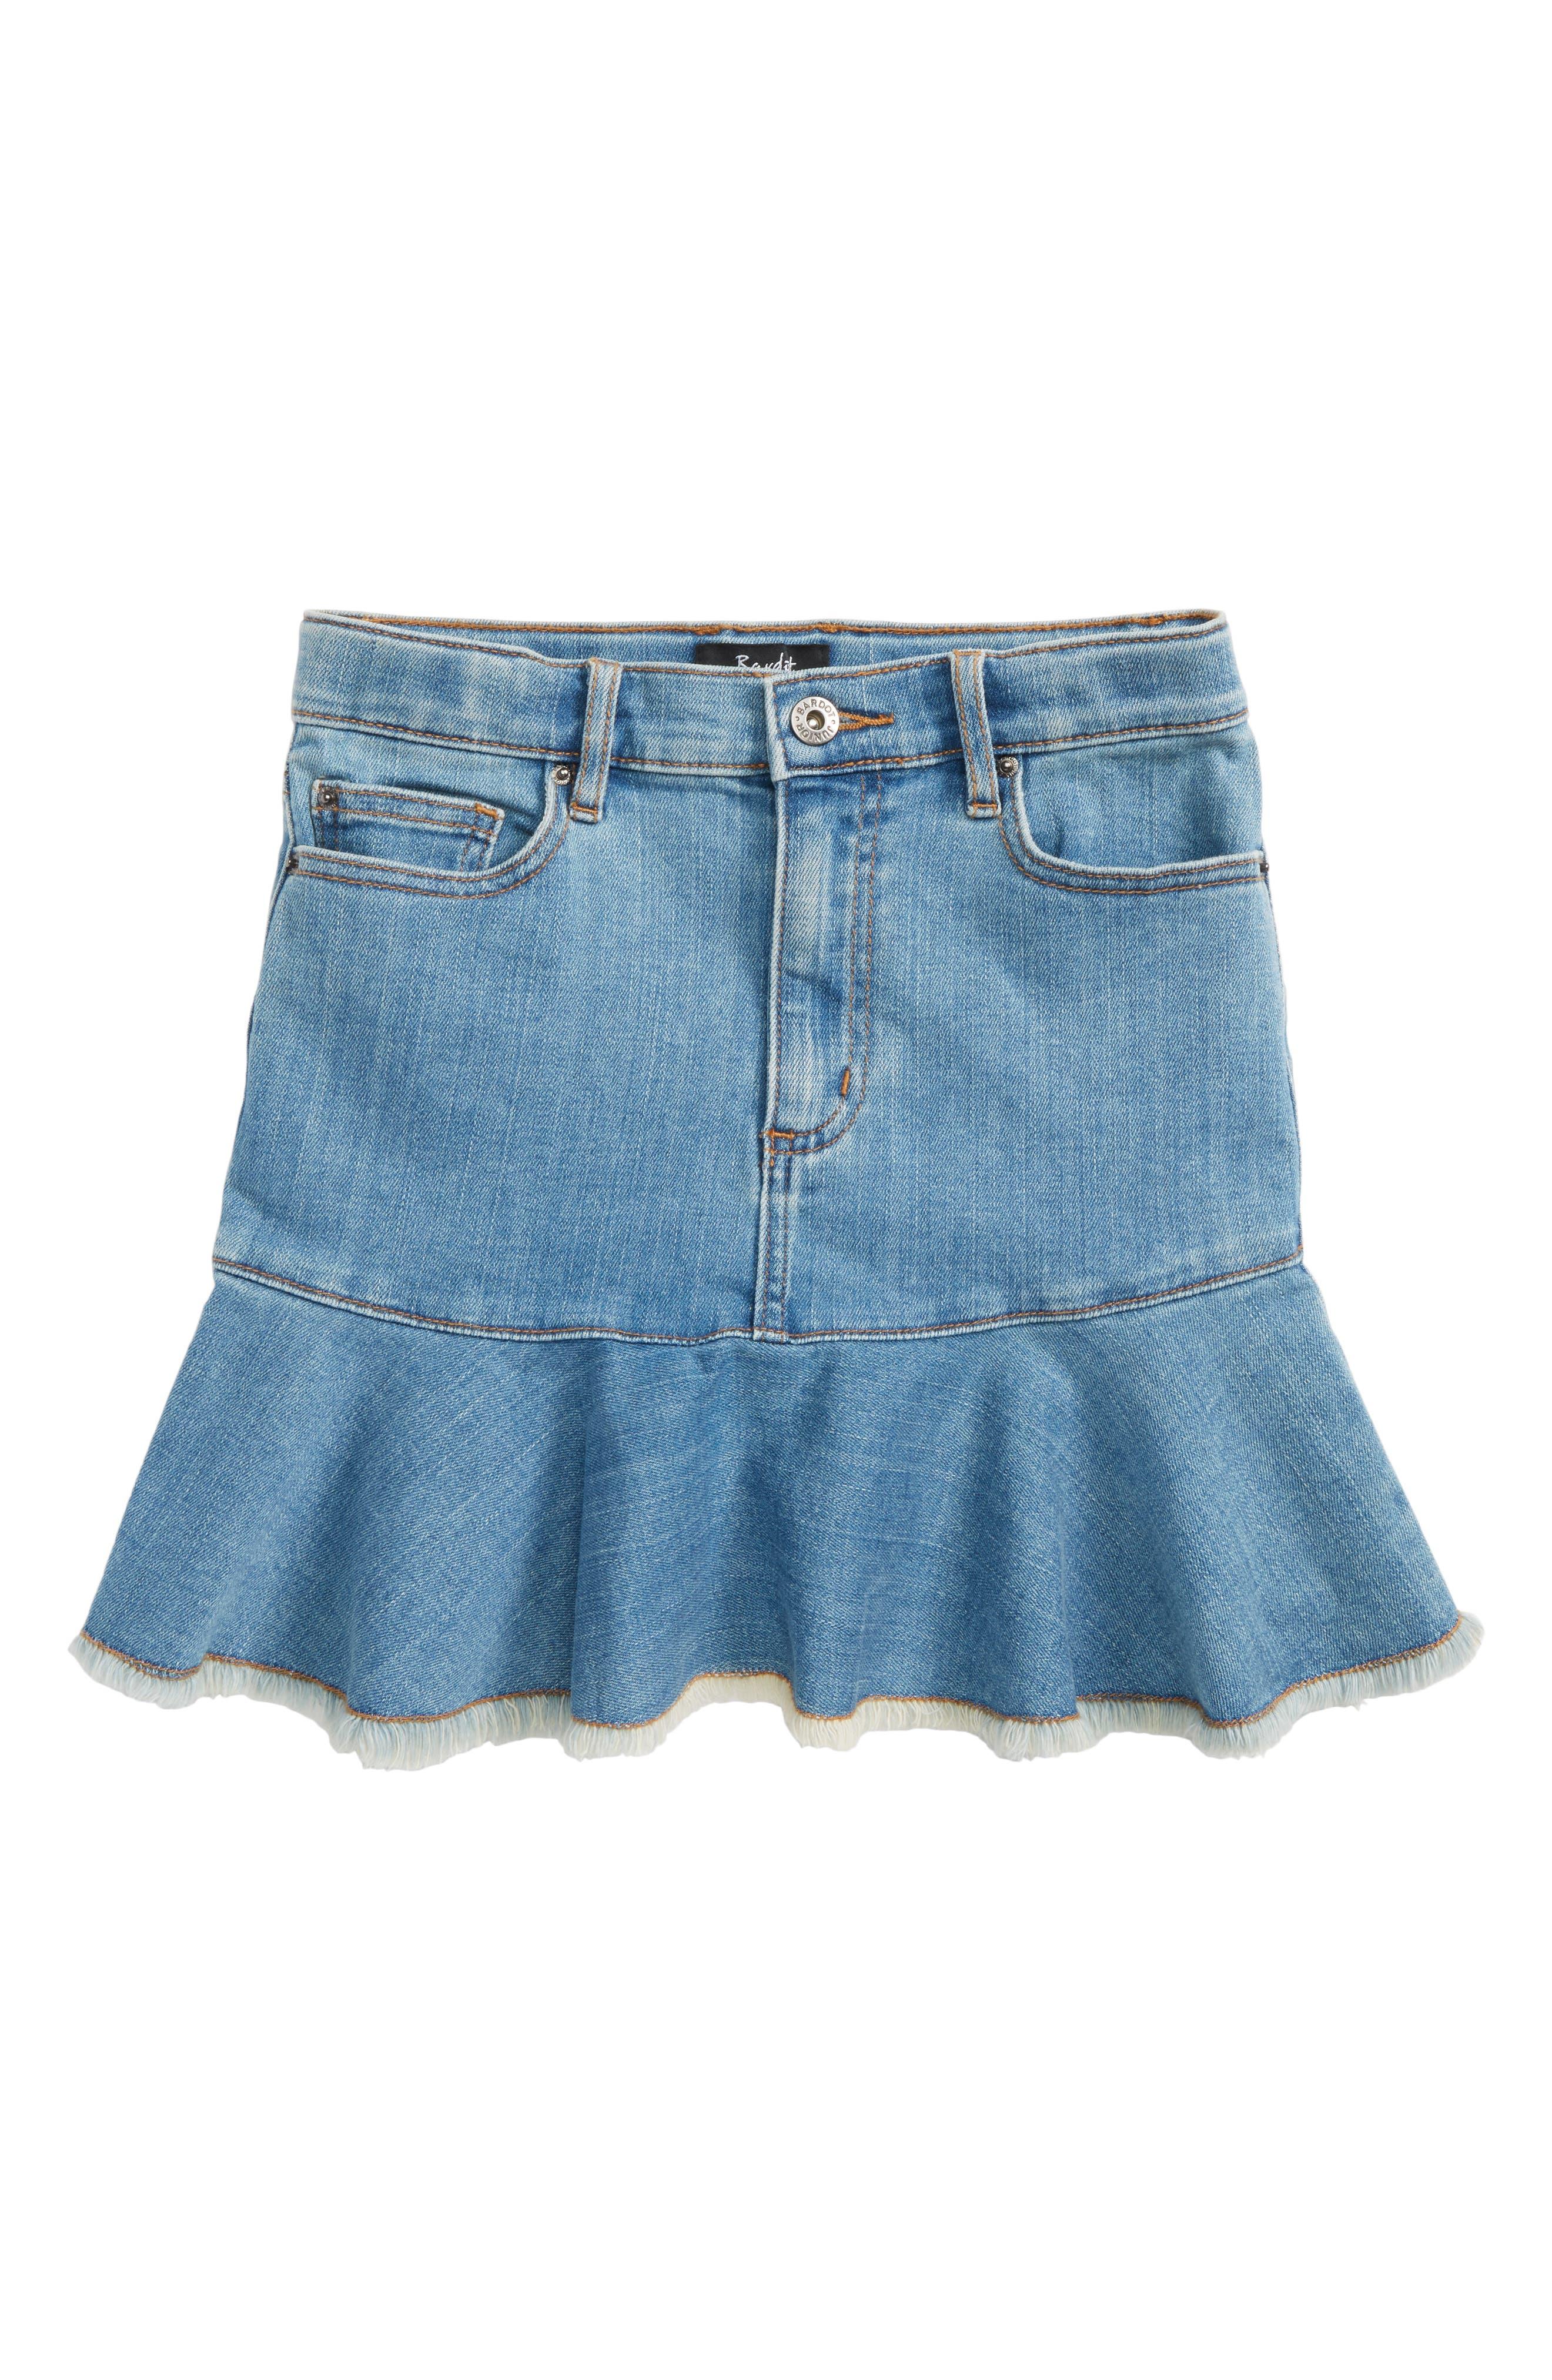 Mia Denim Skirt,                         Main,                         color, Vintage Wash